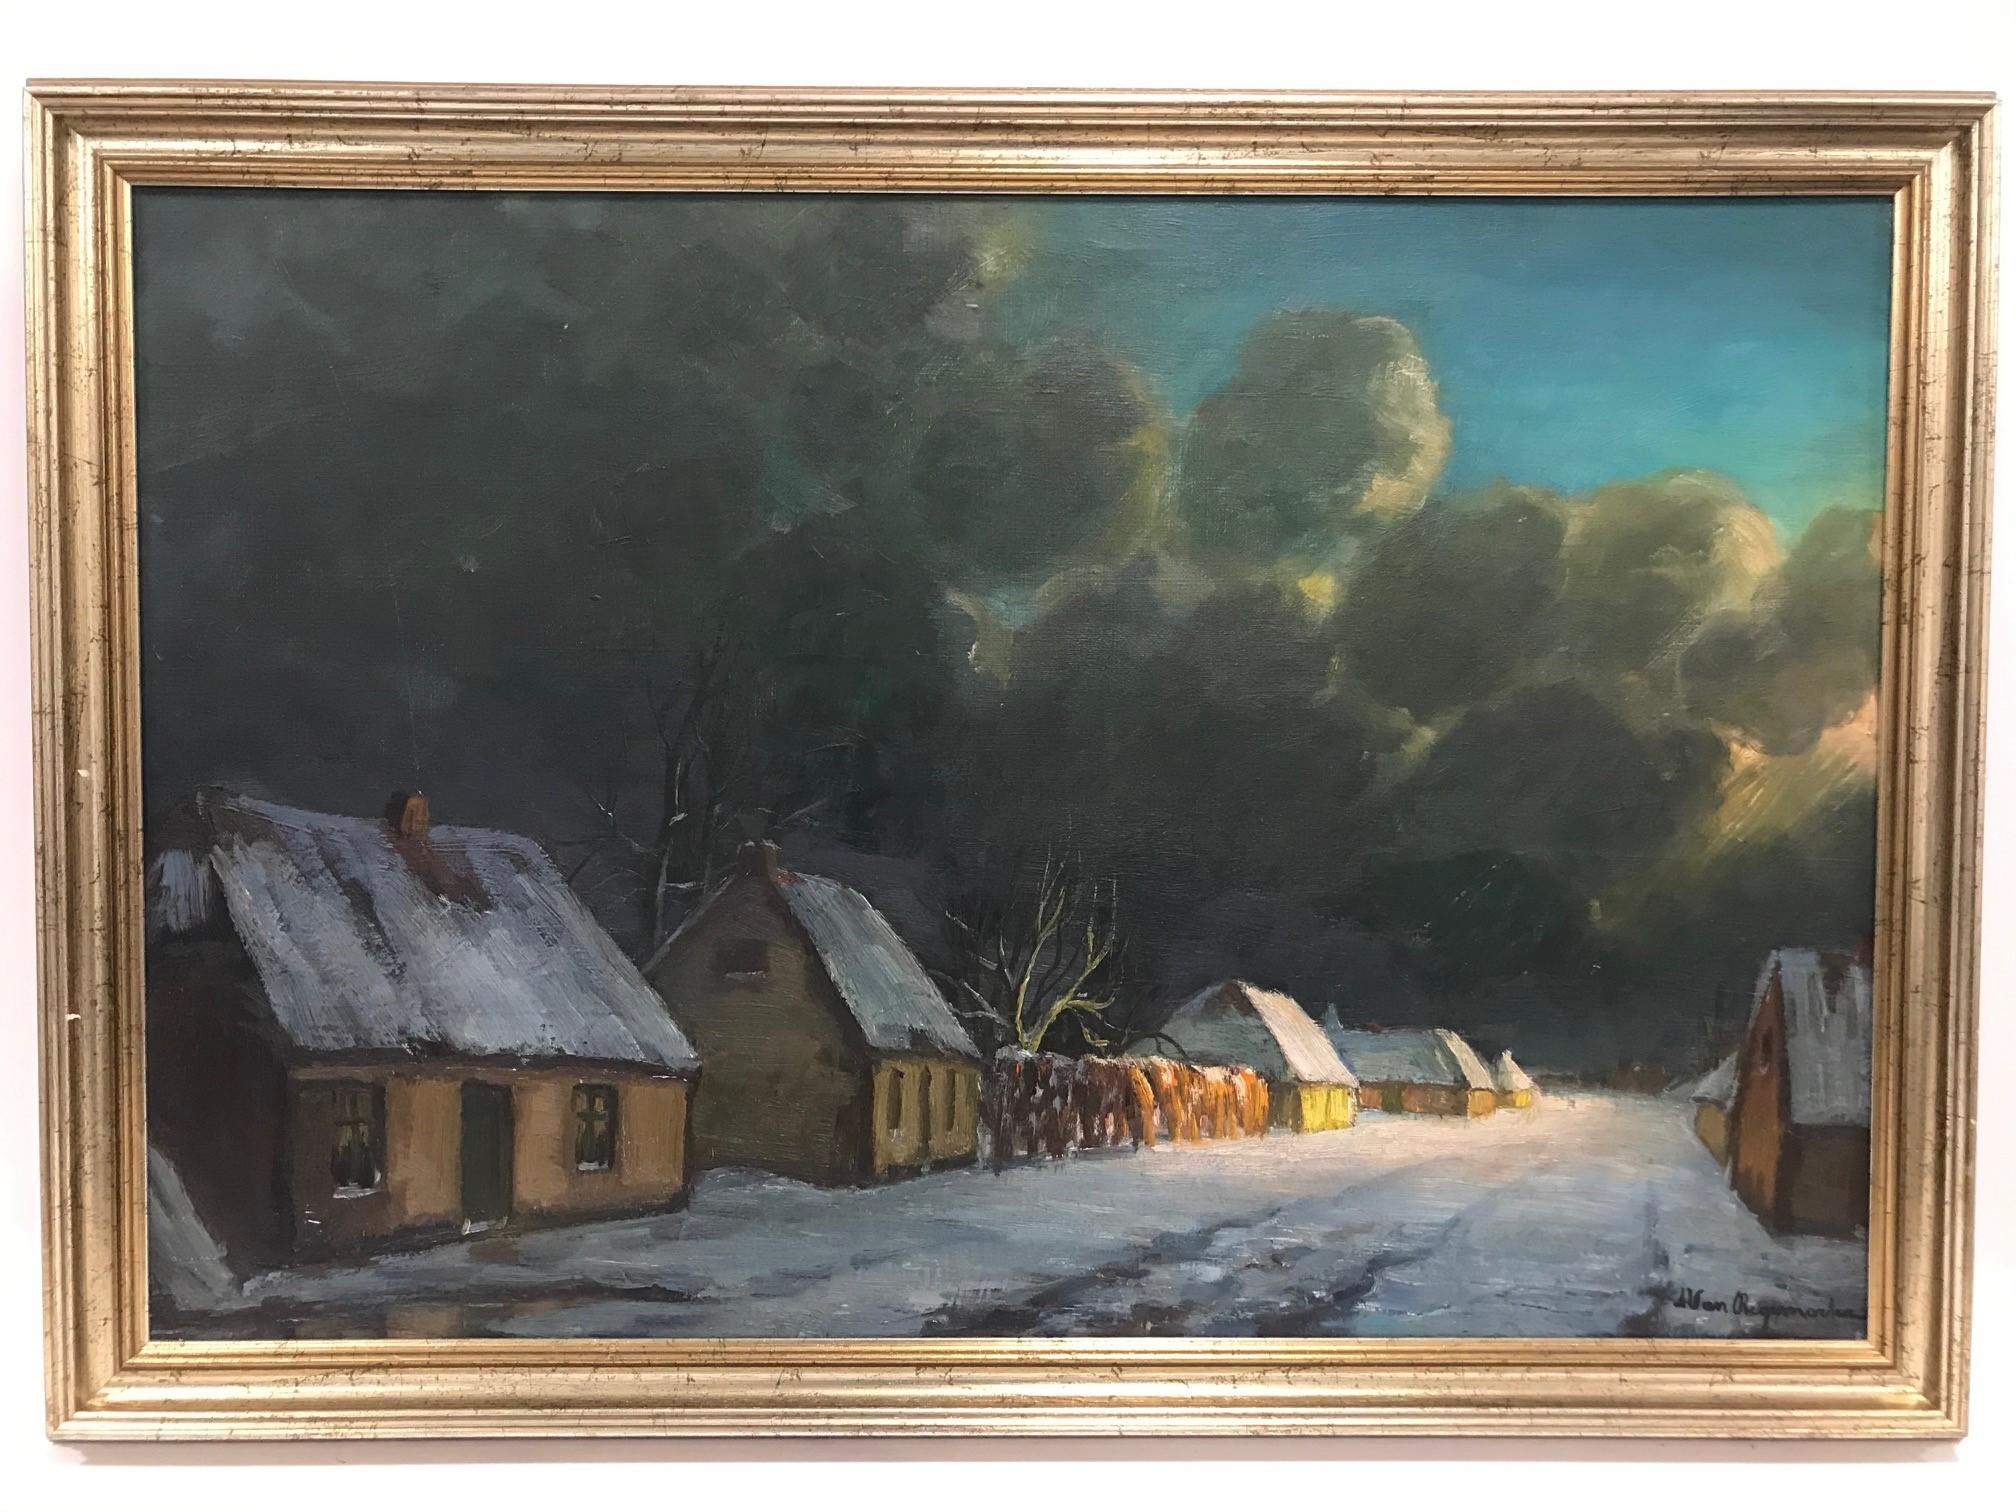 Scandanavian school 20th century, large oil on canvas, Snowy Hamlet Scene, signed lower right,